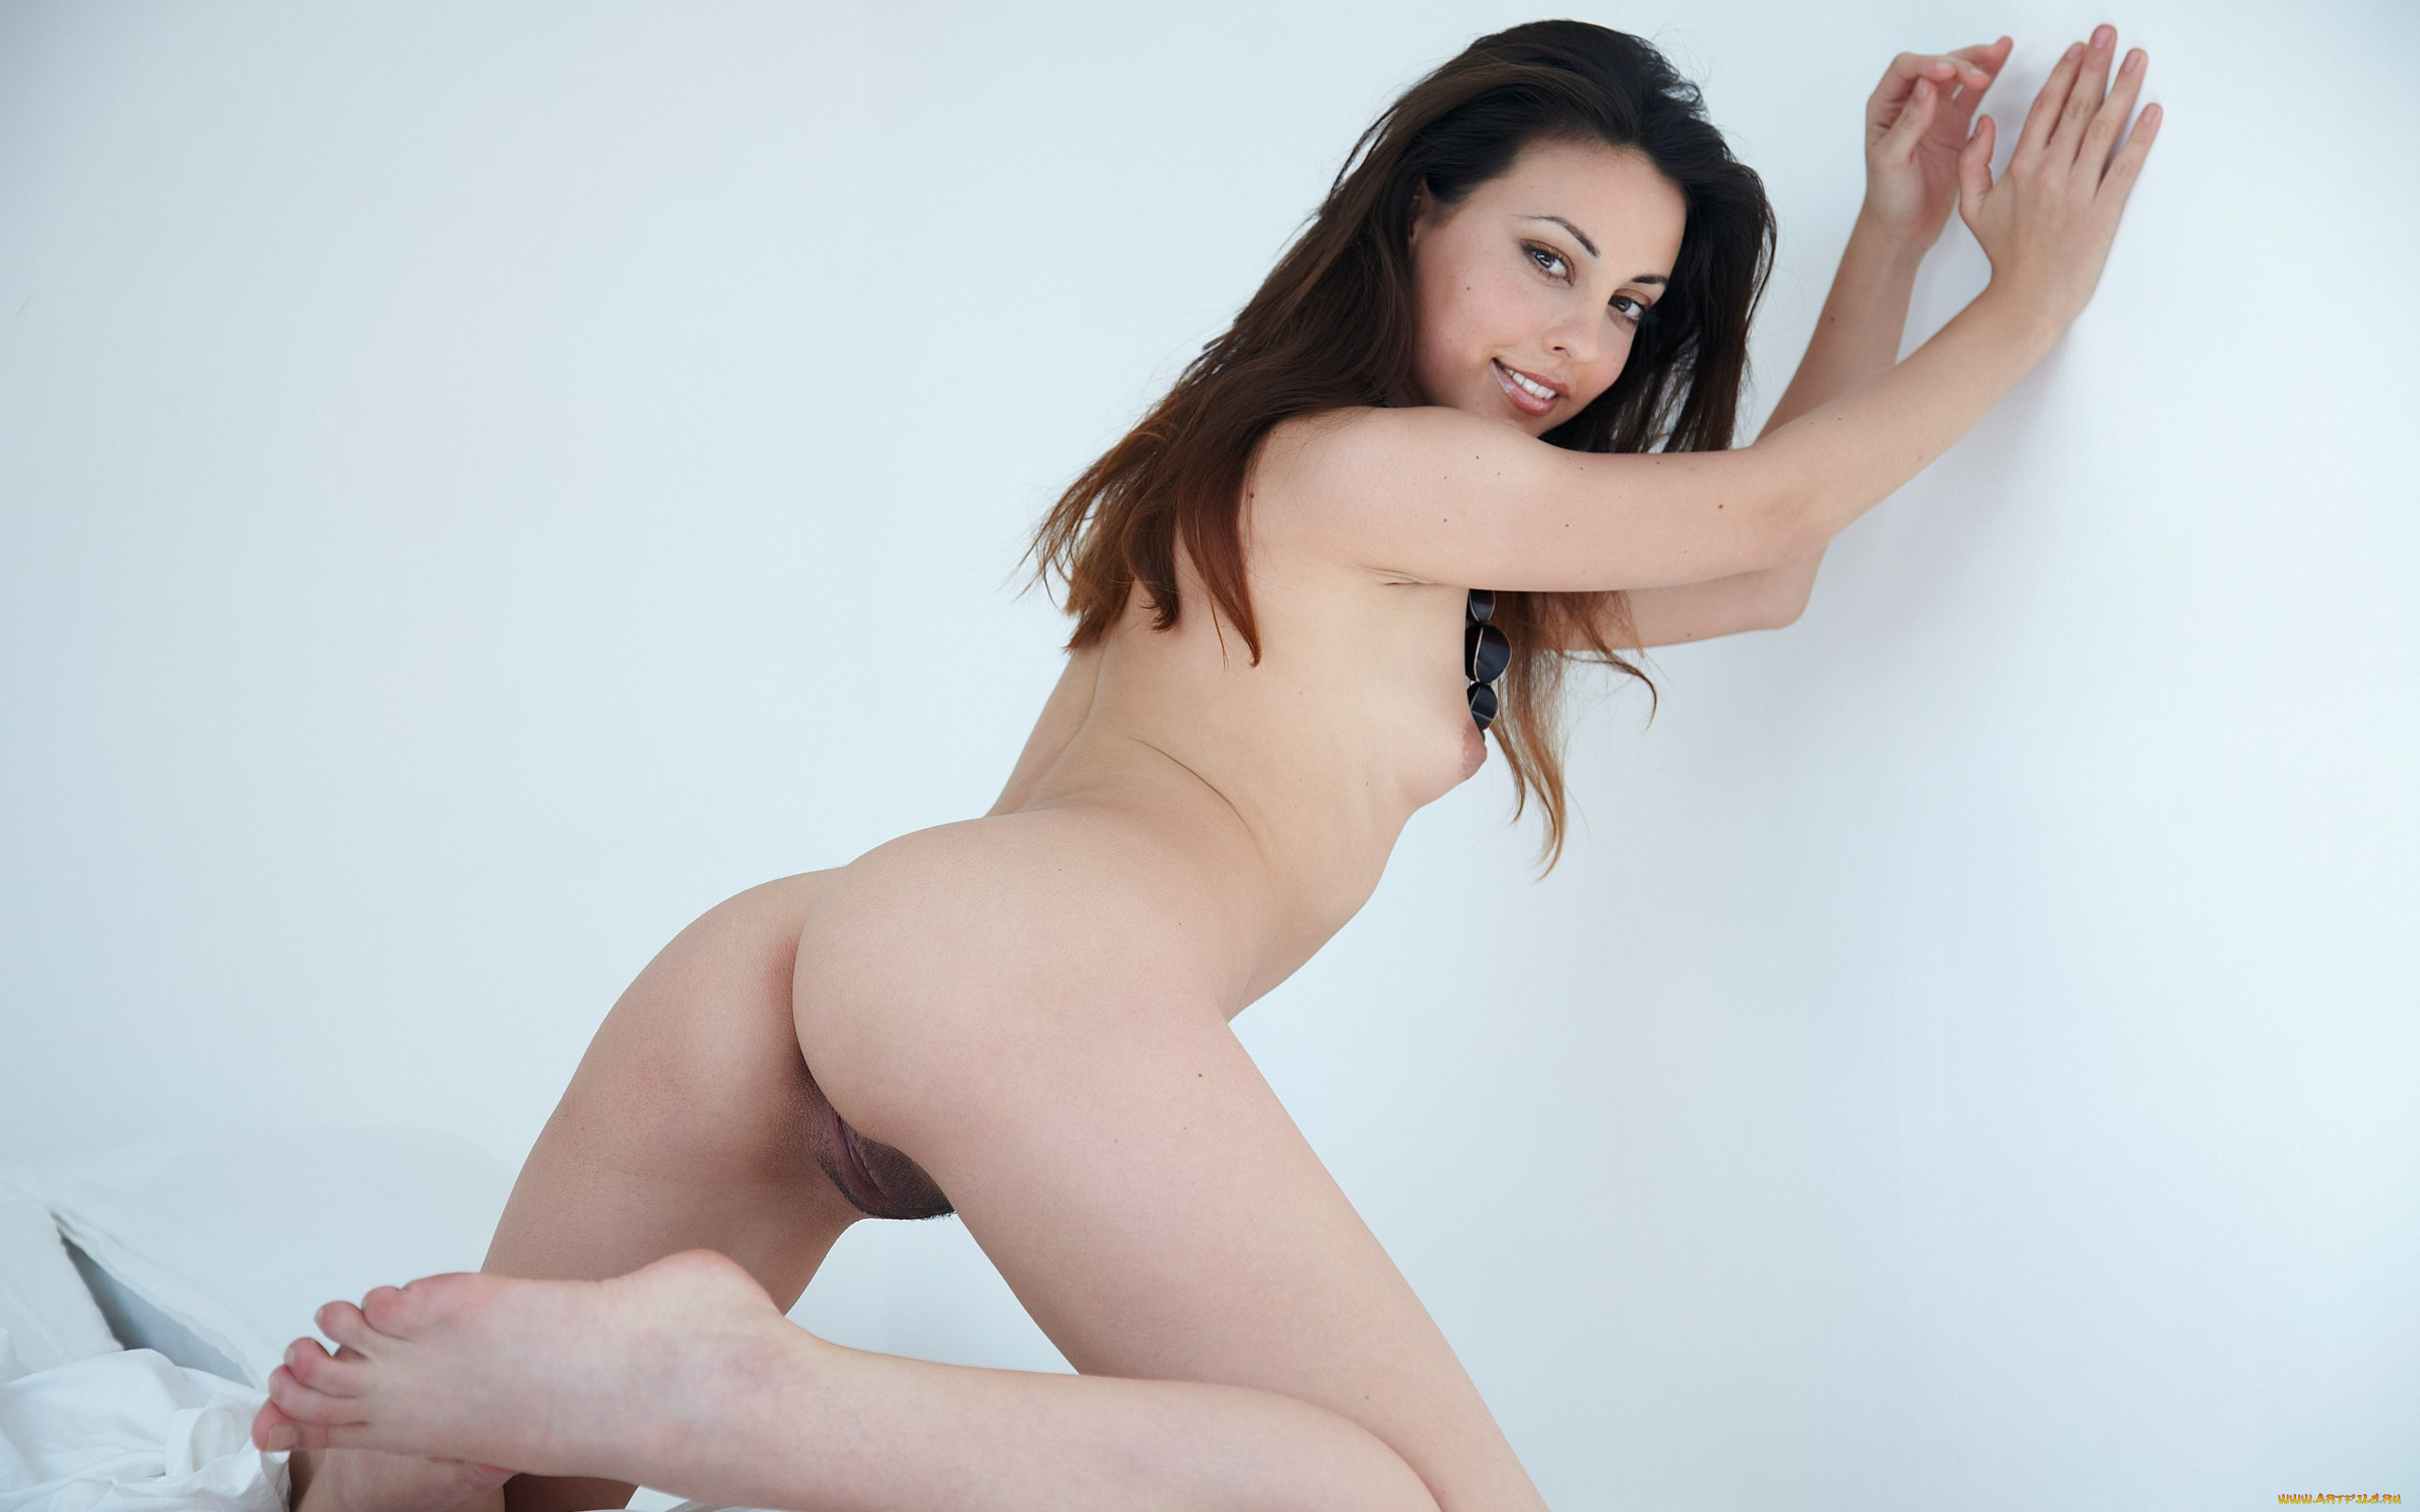 pro-seks-foto-obnazhennih-gerl-porno